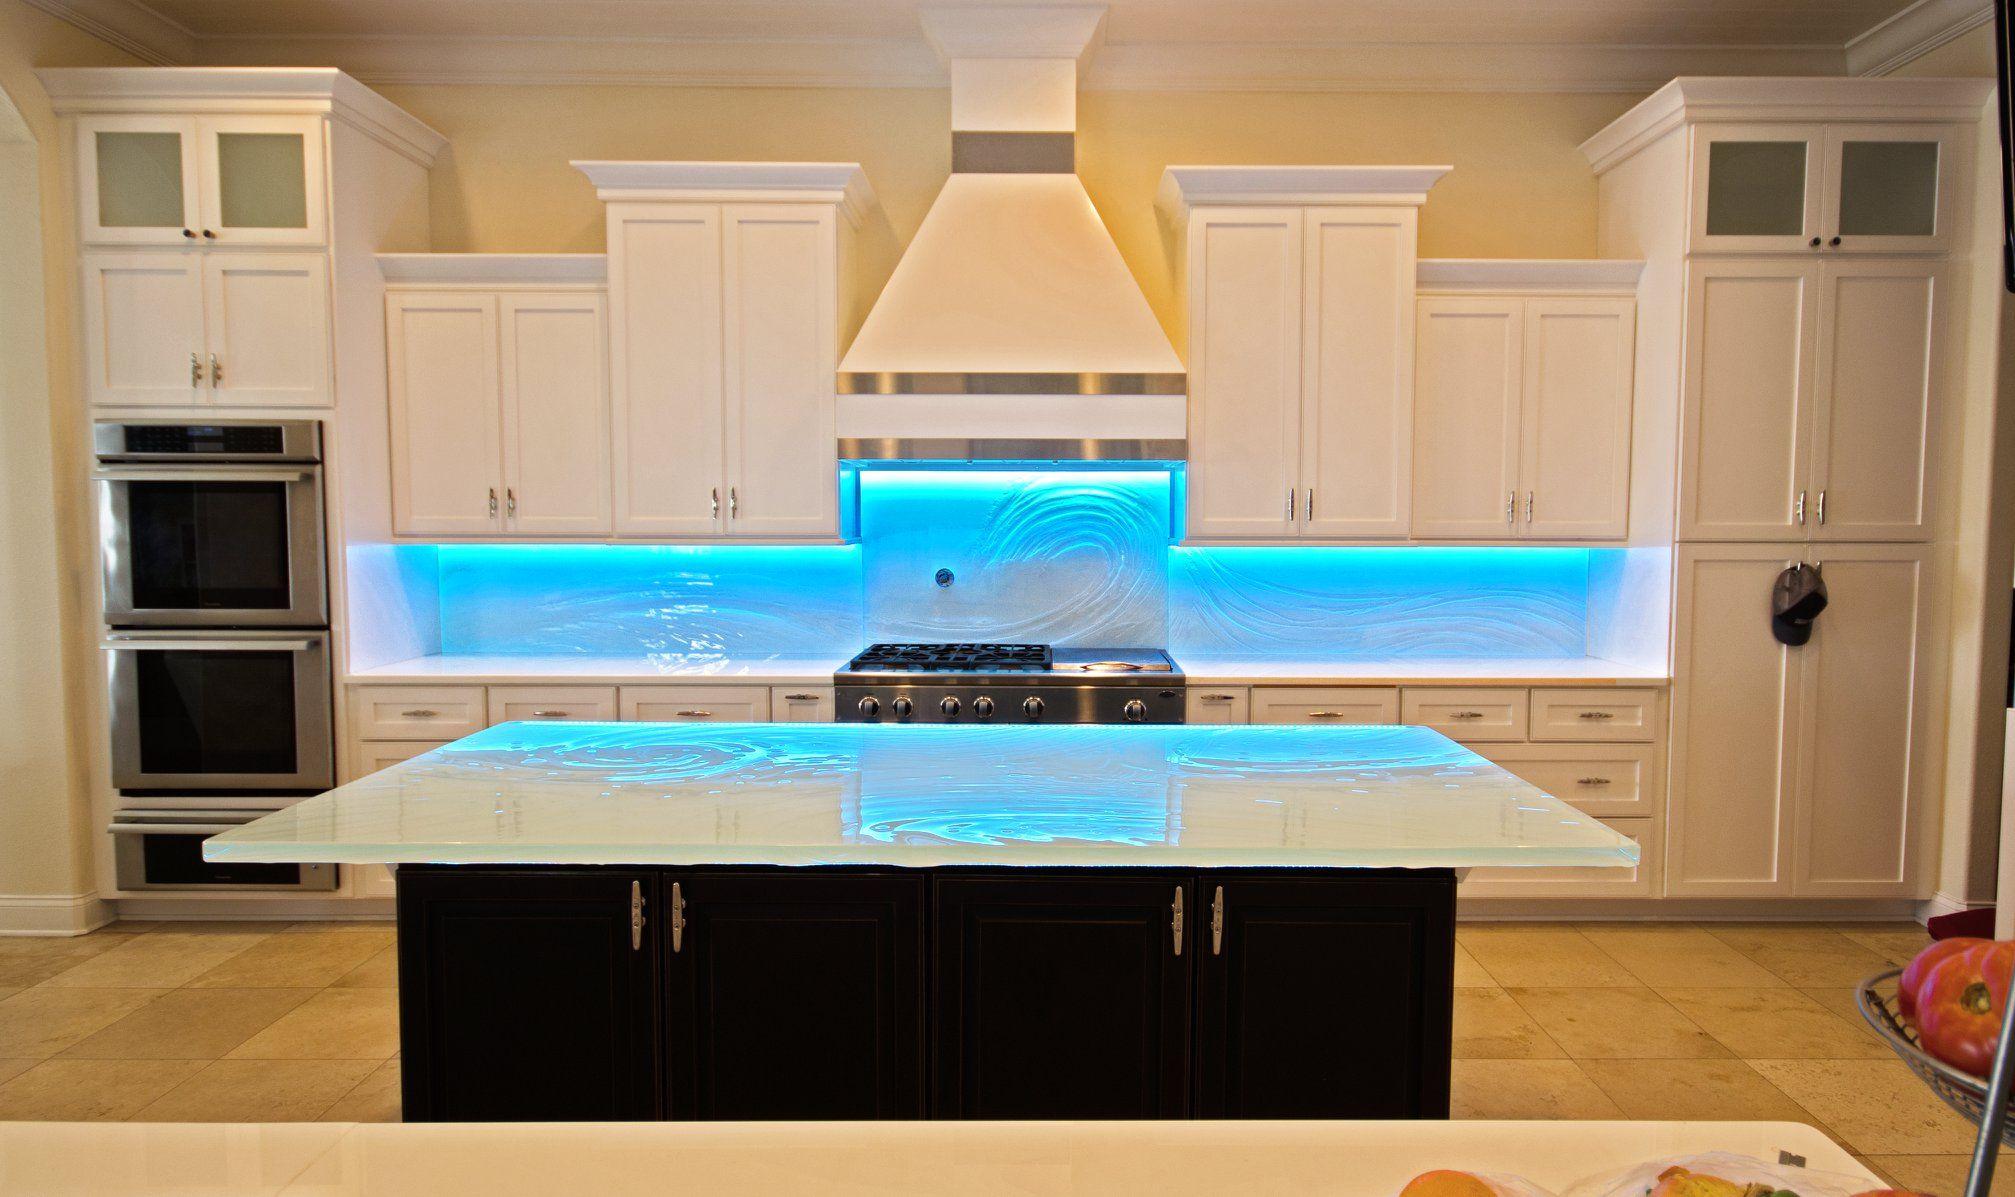 - WIFI Smart Waterproof LED Strip Light Smart Phone Controlled